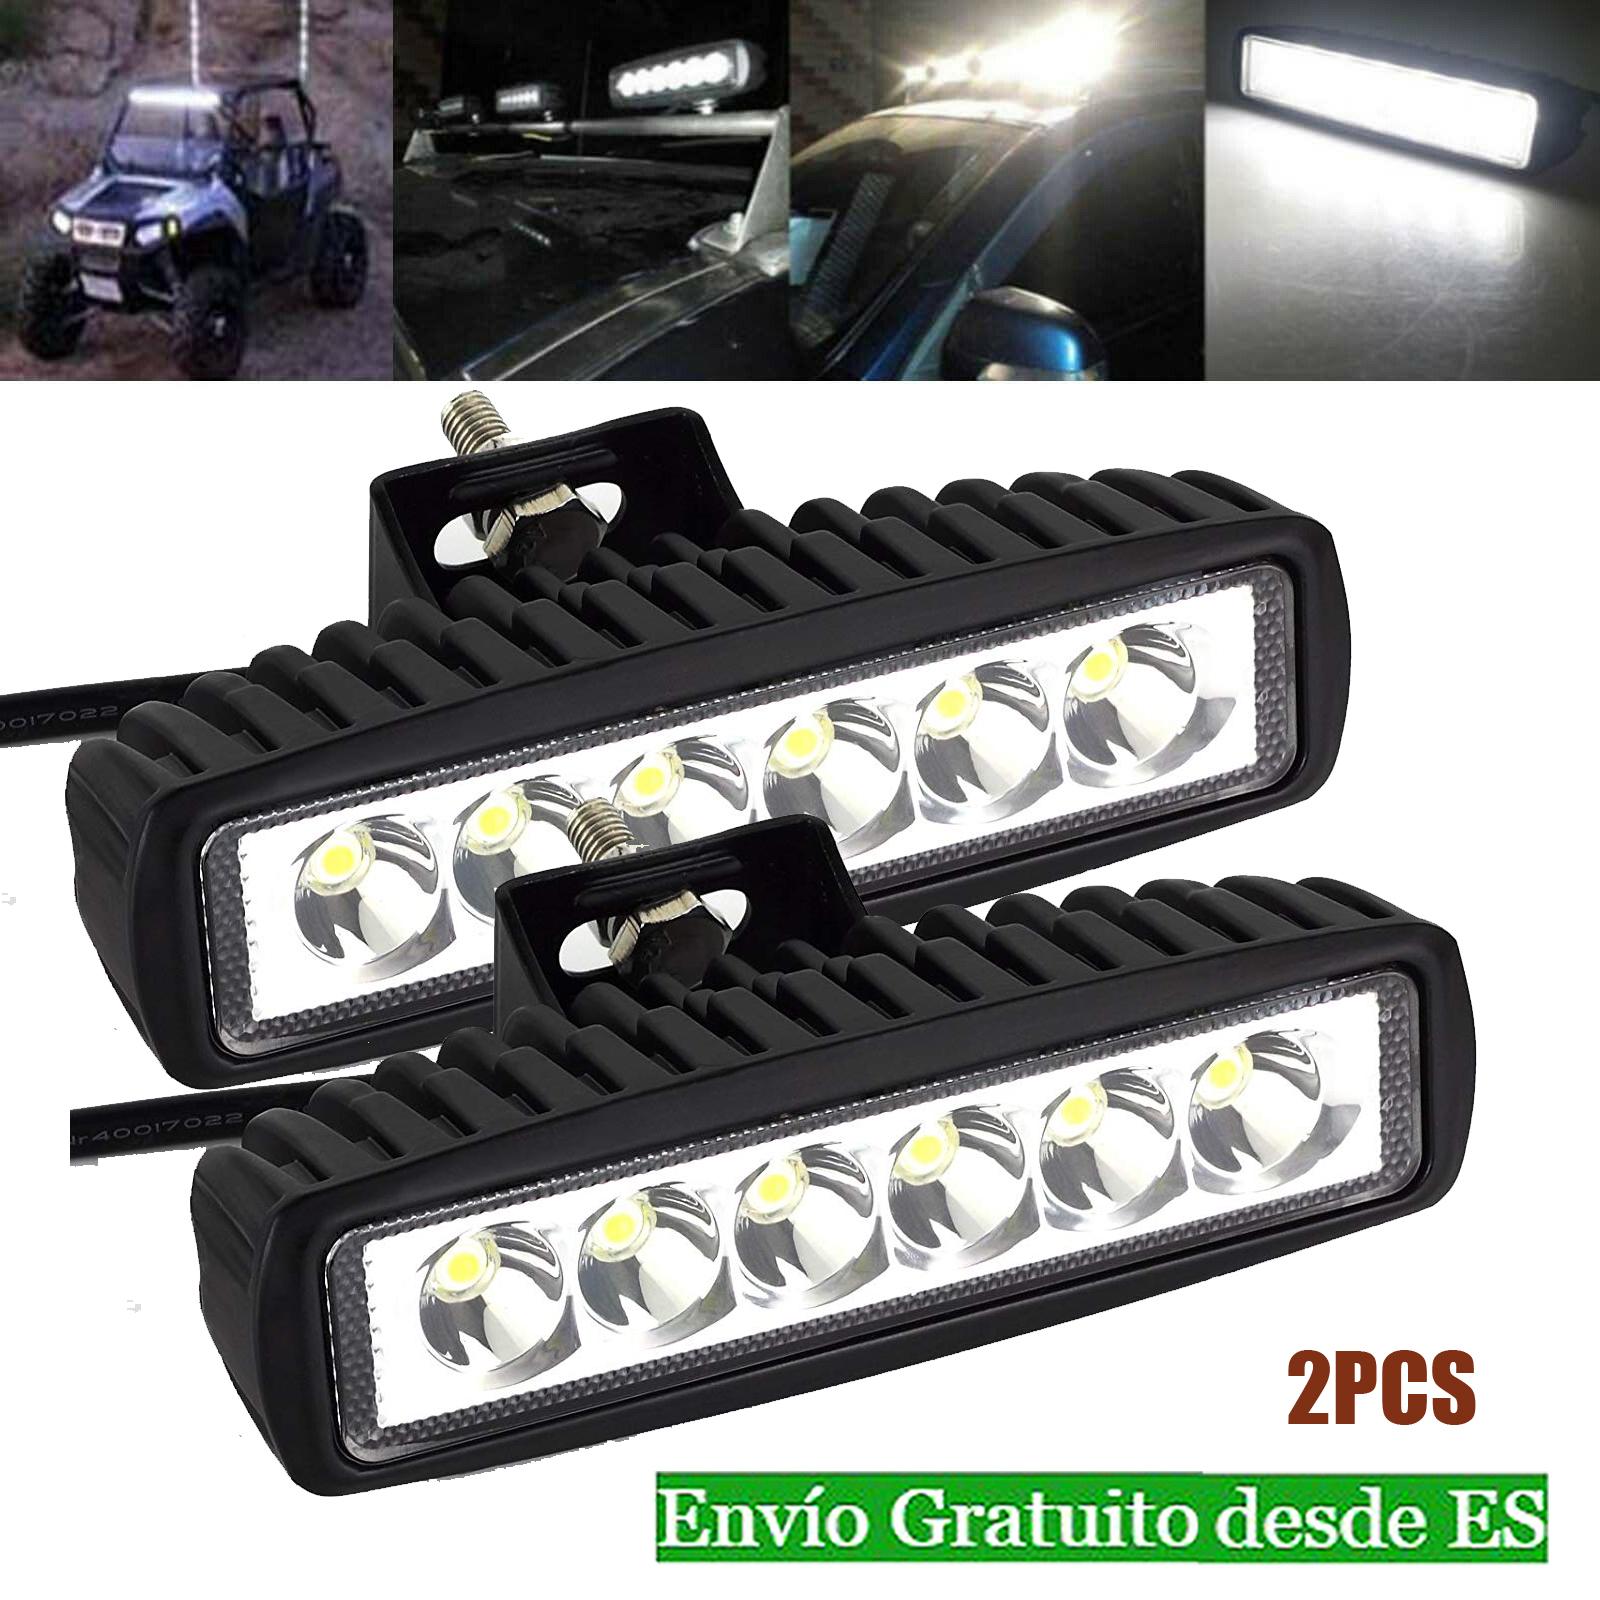 4x 12V 24V LED Lámpara De Trabajo Spot Luz 51W Offroad Camión Barco ATV SUV car Bar Spot